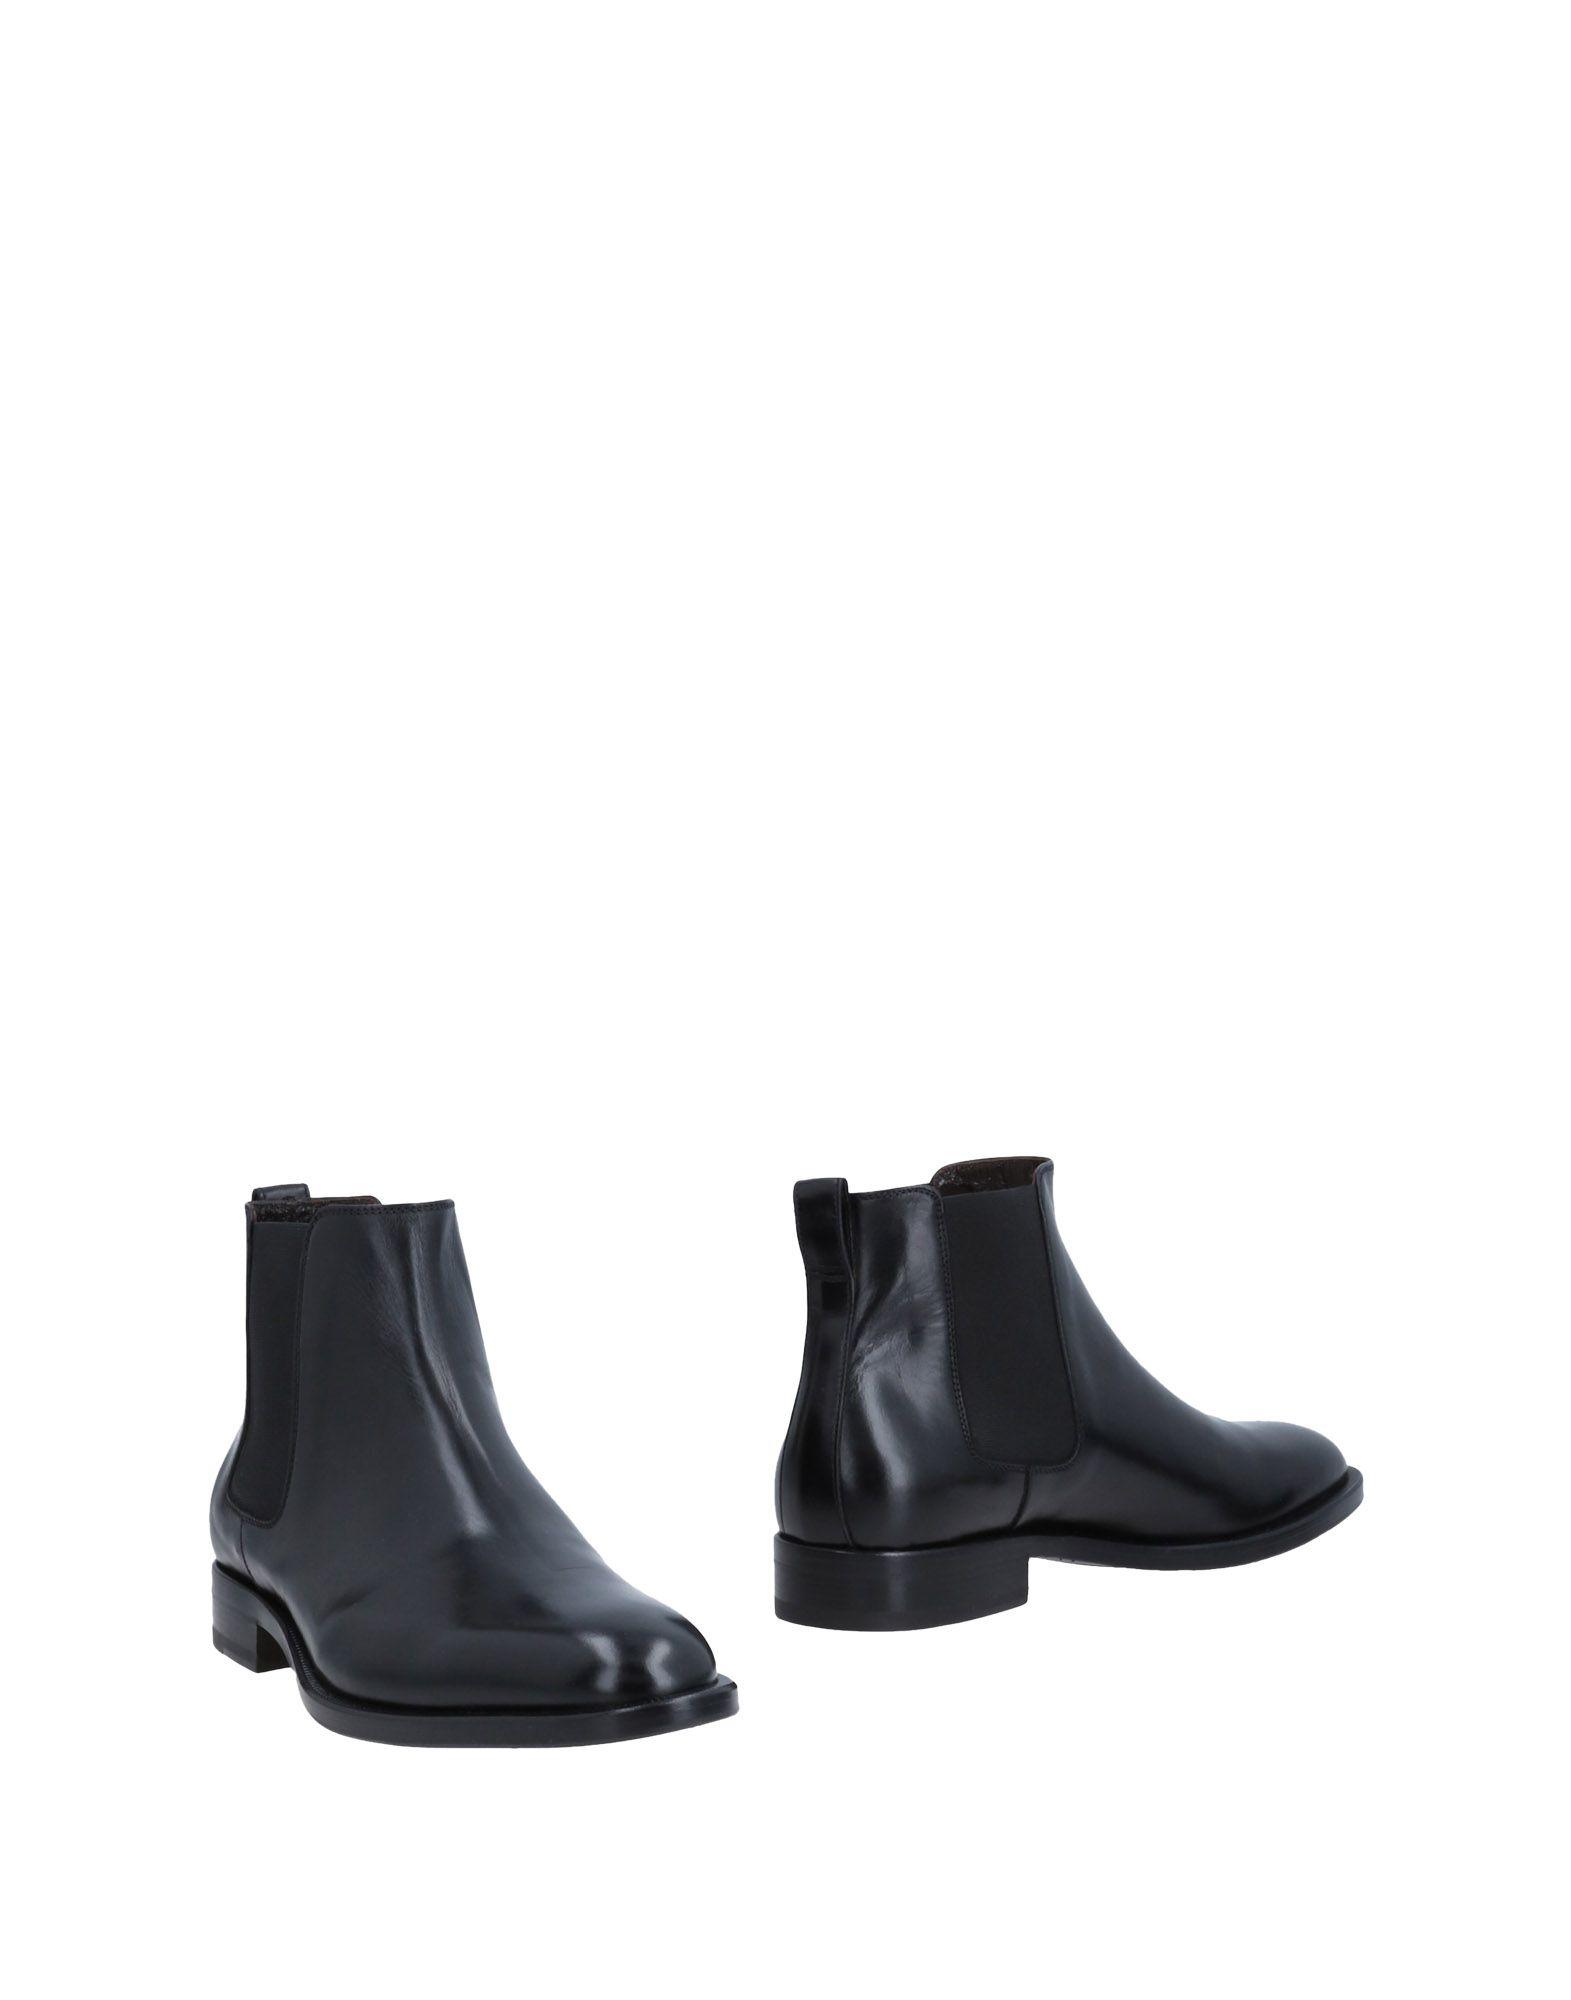 MAGLI by BRUNO MAGLI Полусапоги и высокие ботинки